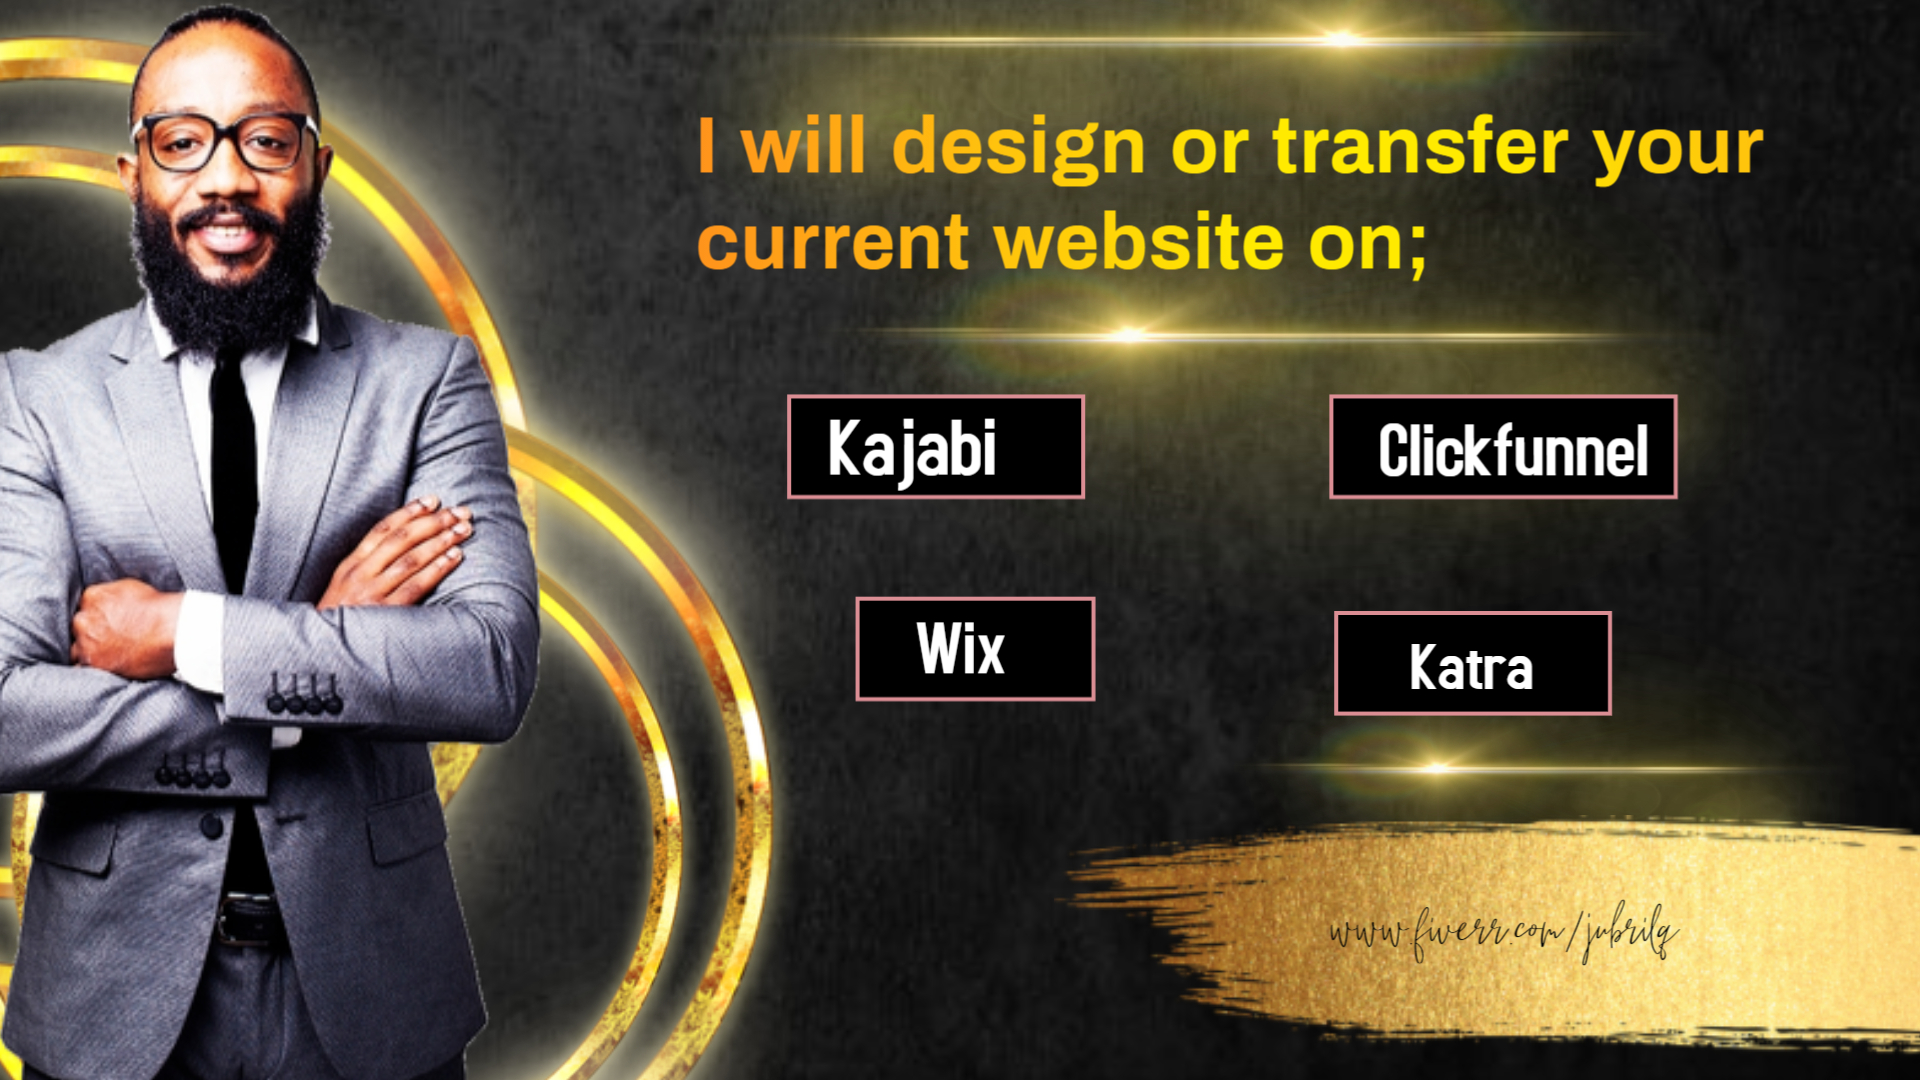 I will design or transfer your current website on clickfunnel,kartra, FiverrBox